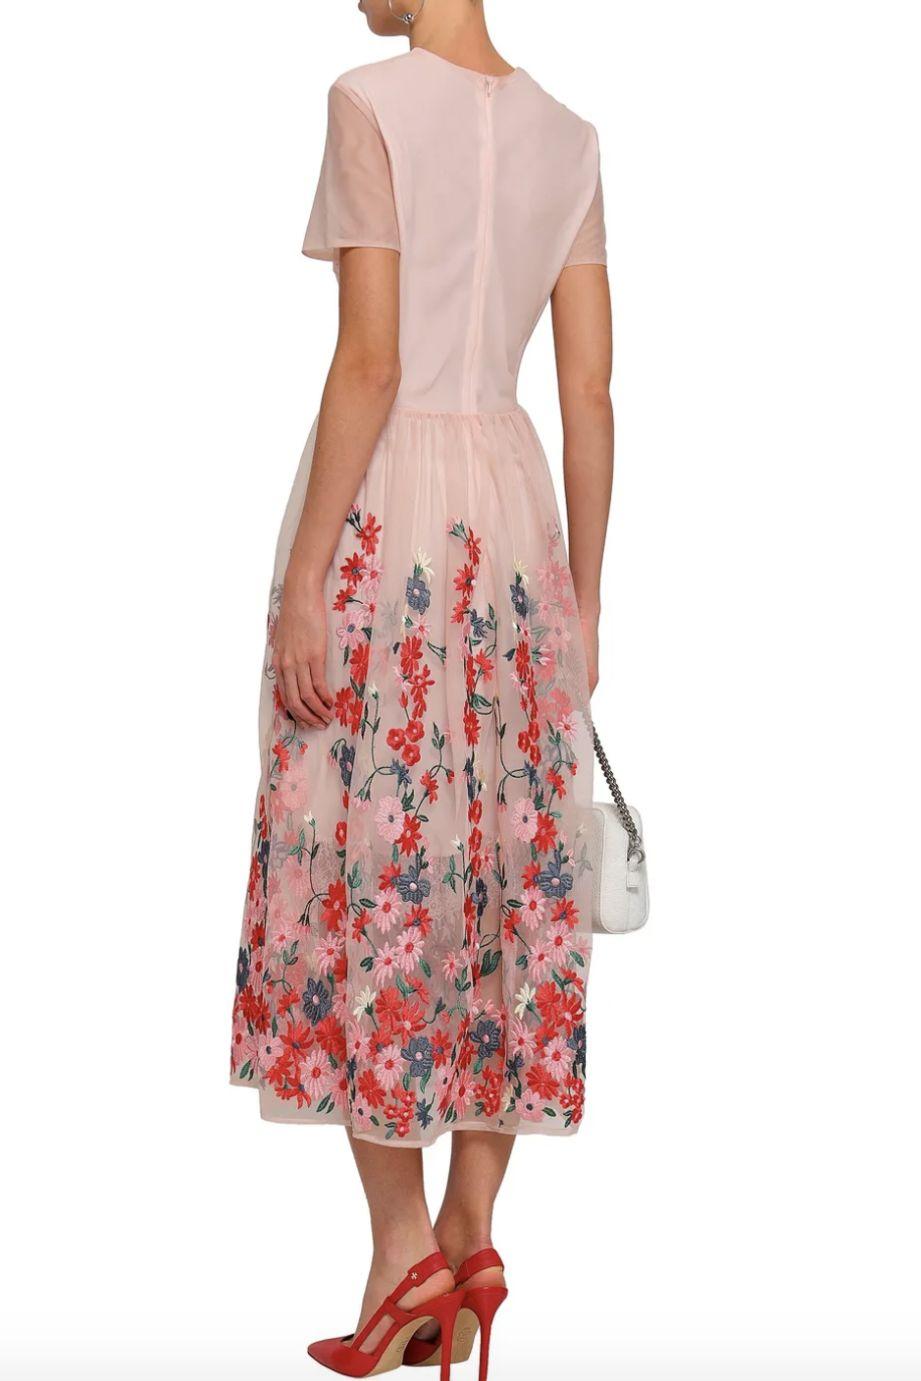 Maje Raphael Floral Dress 4 Preview Images